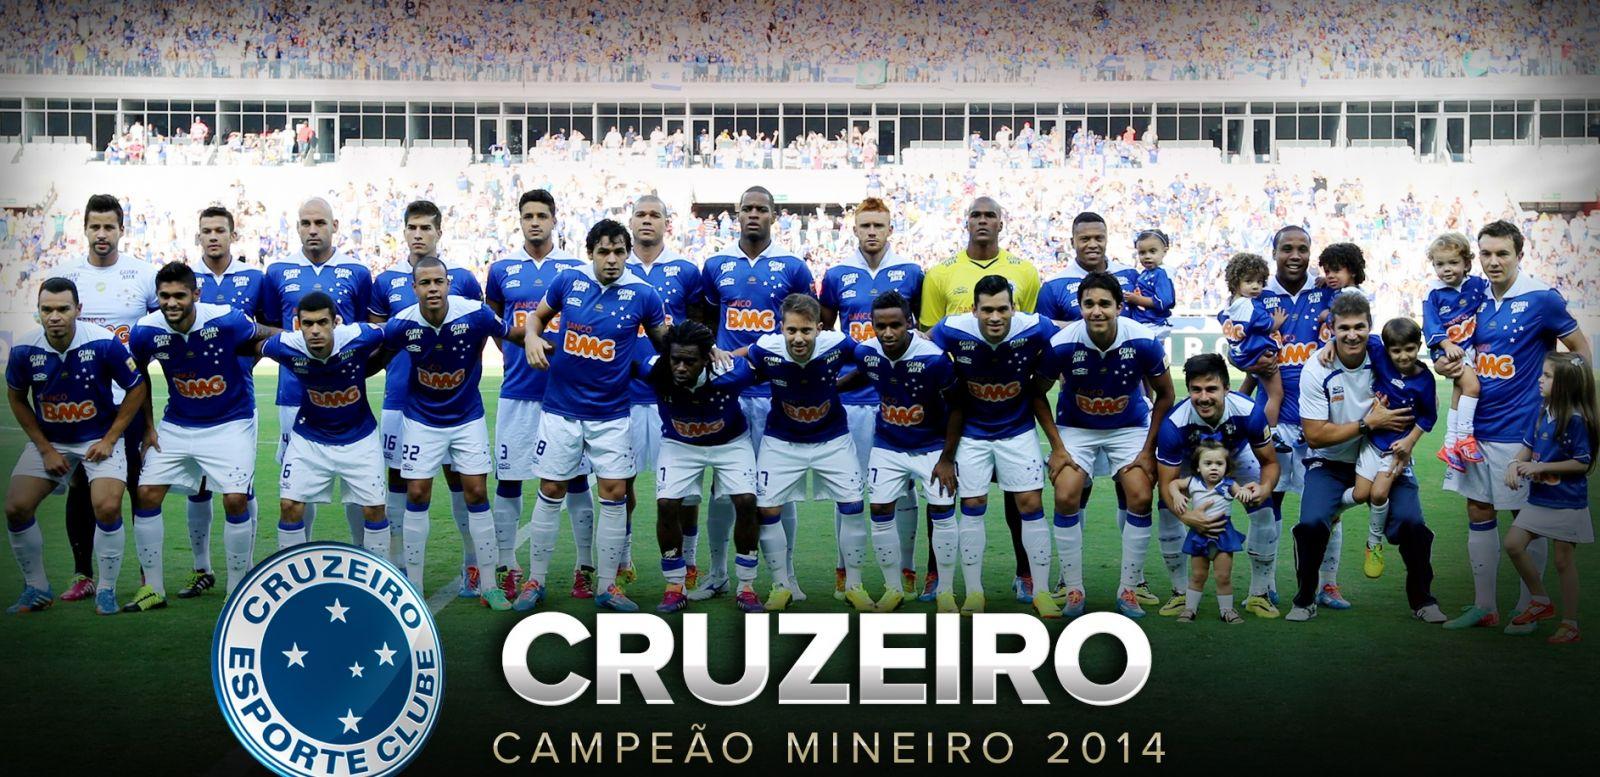 Cruzeiro campe?o mineiro 2014